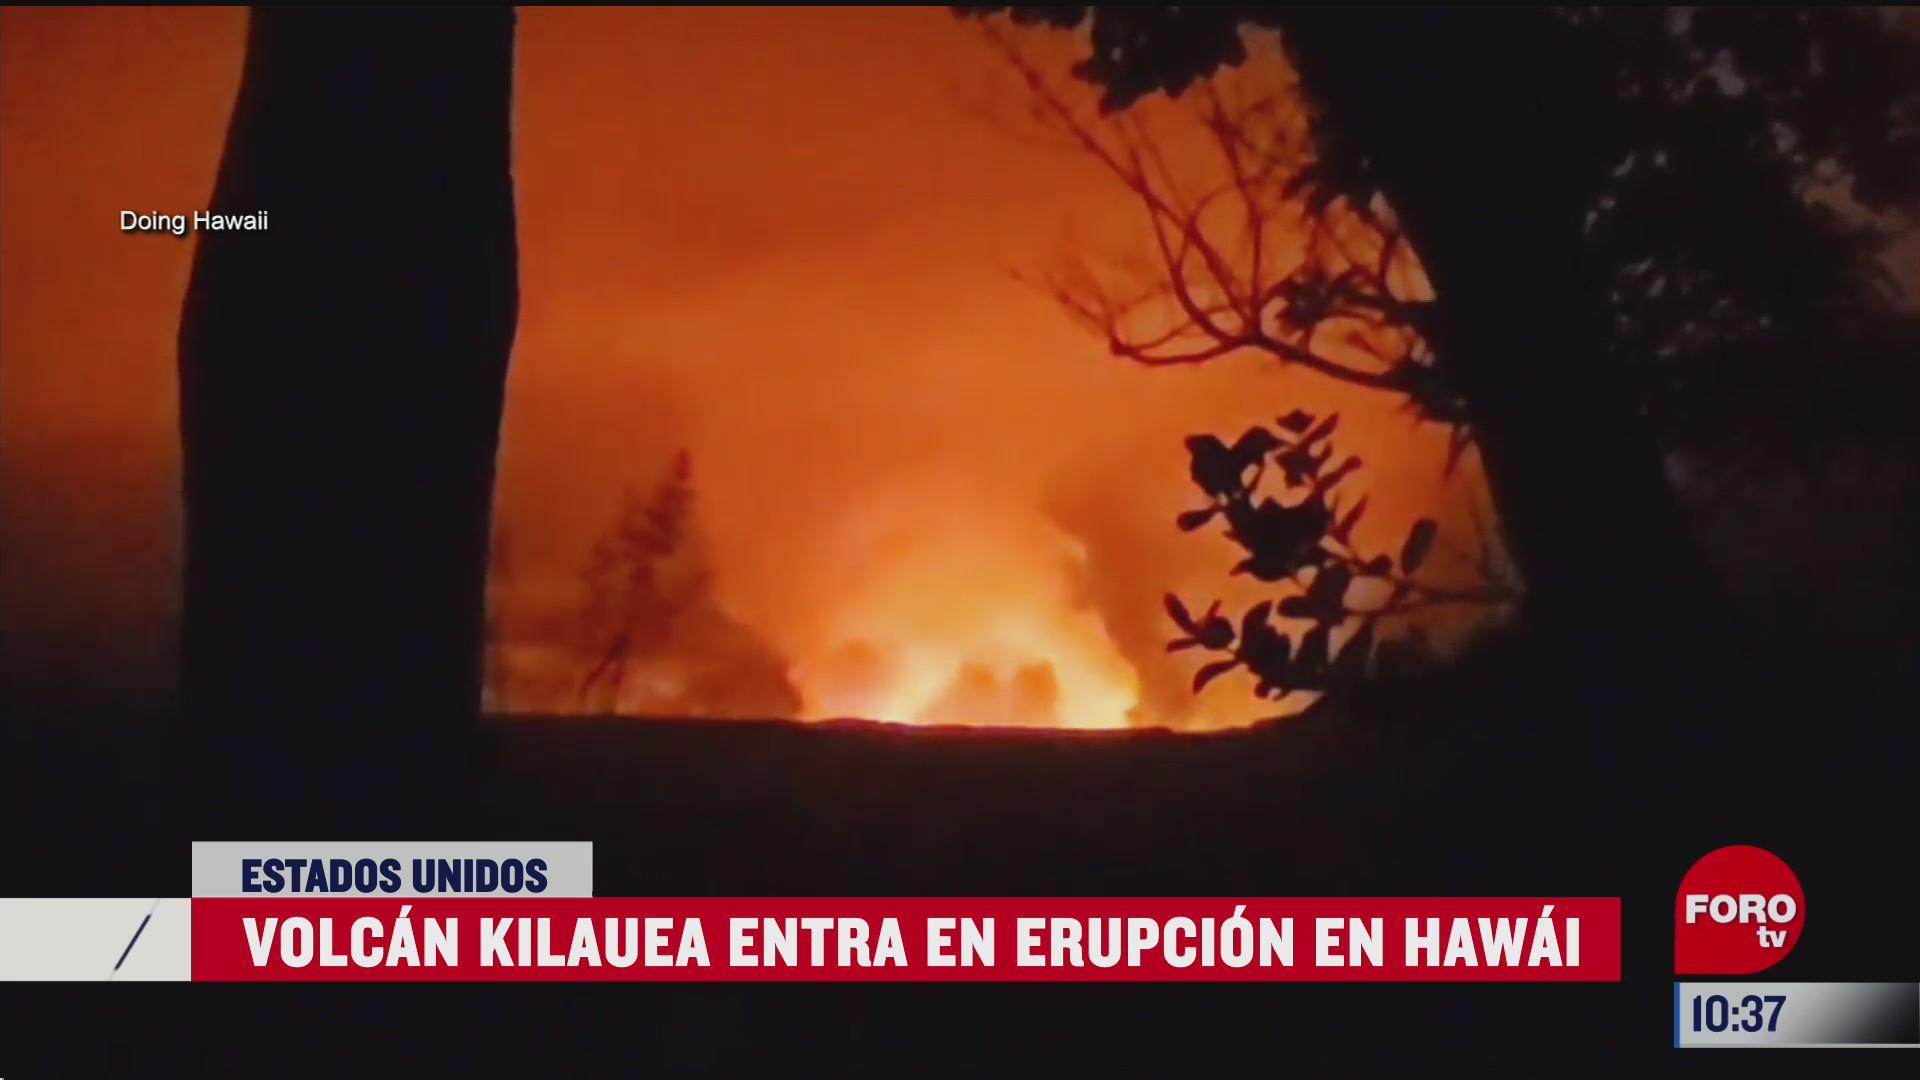 volcan kilauea hace erupcion en hawai